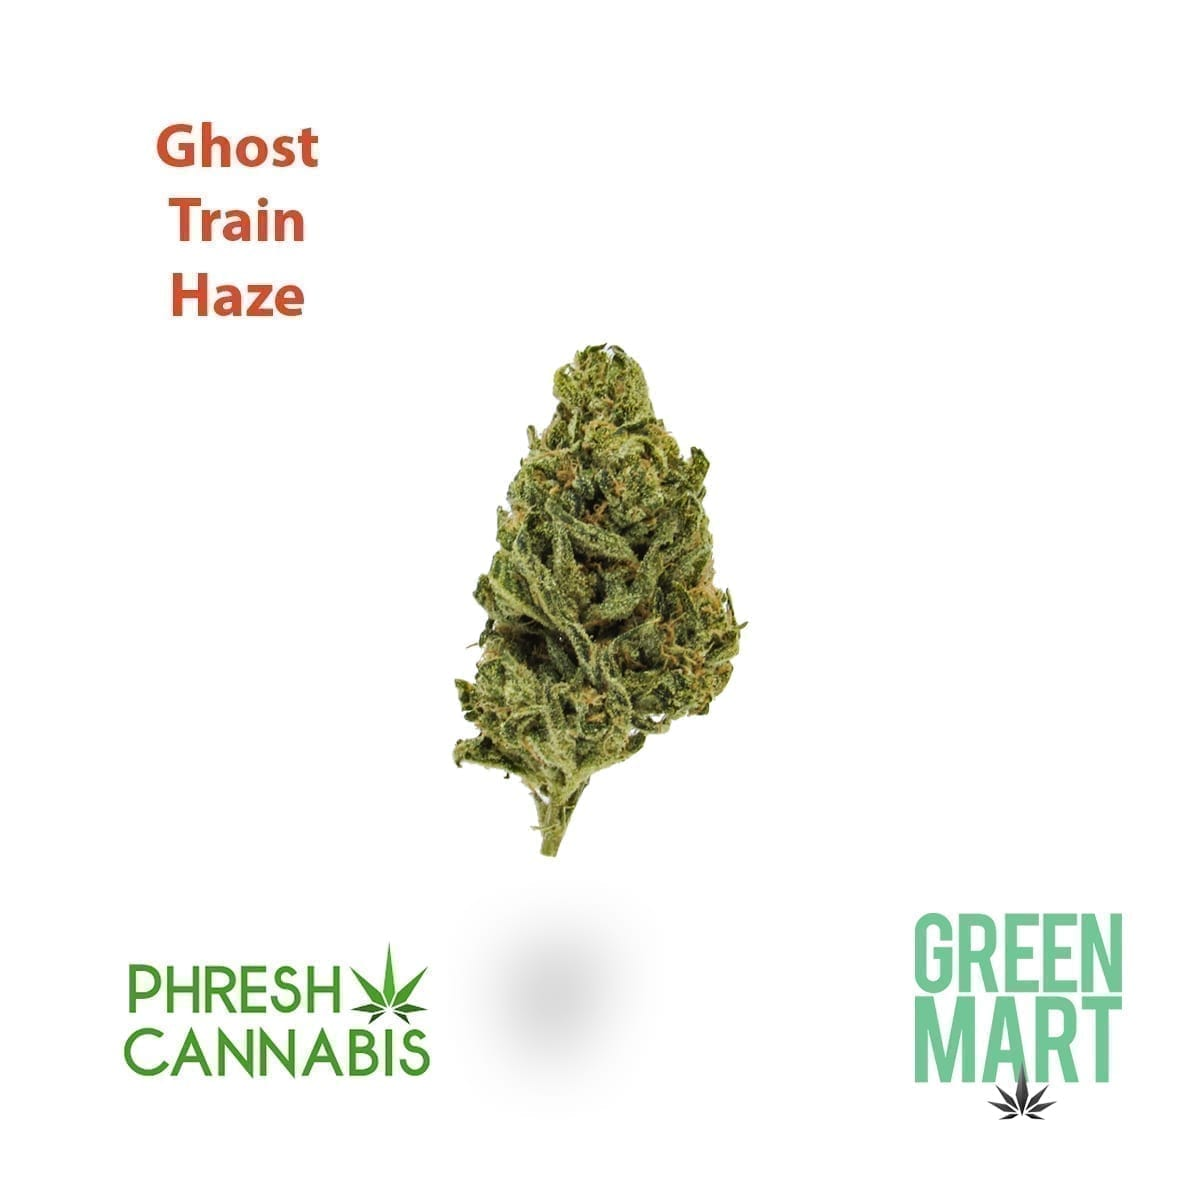 Phresh Cannabis Ghost Train Haze Flower